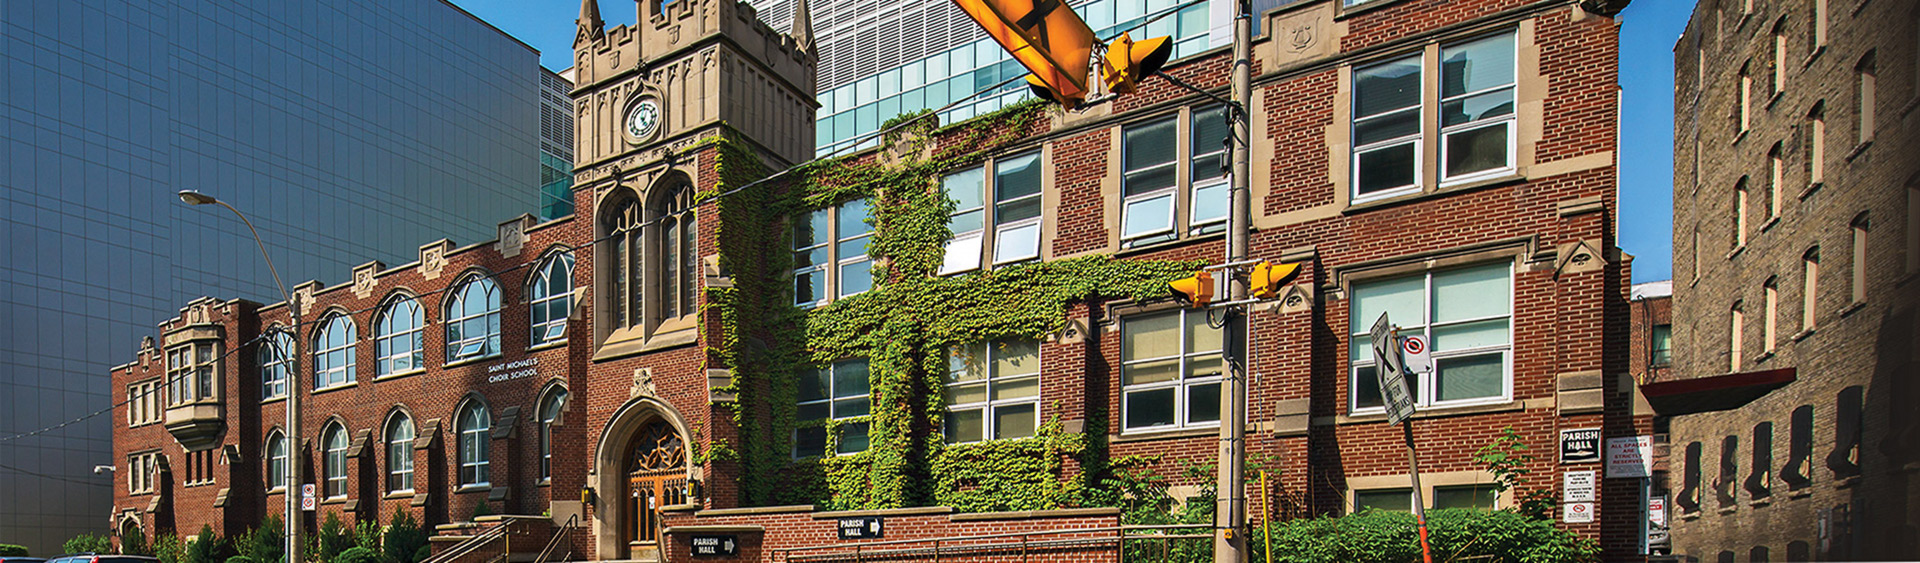 SMSC School Building